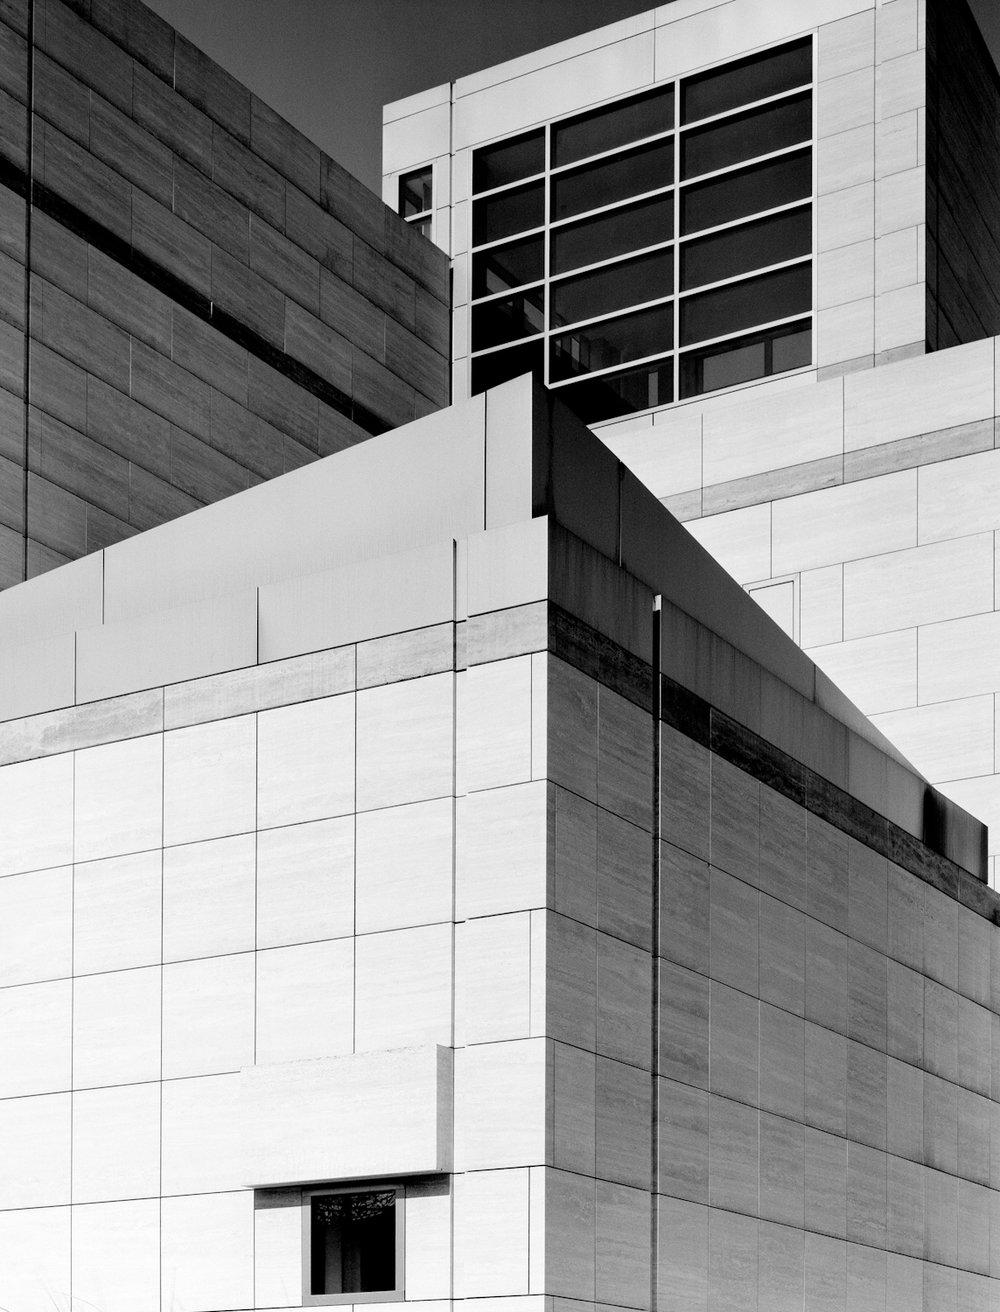 41_Architecture-real-estate-photographer-f1136904983.jpg